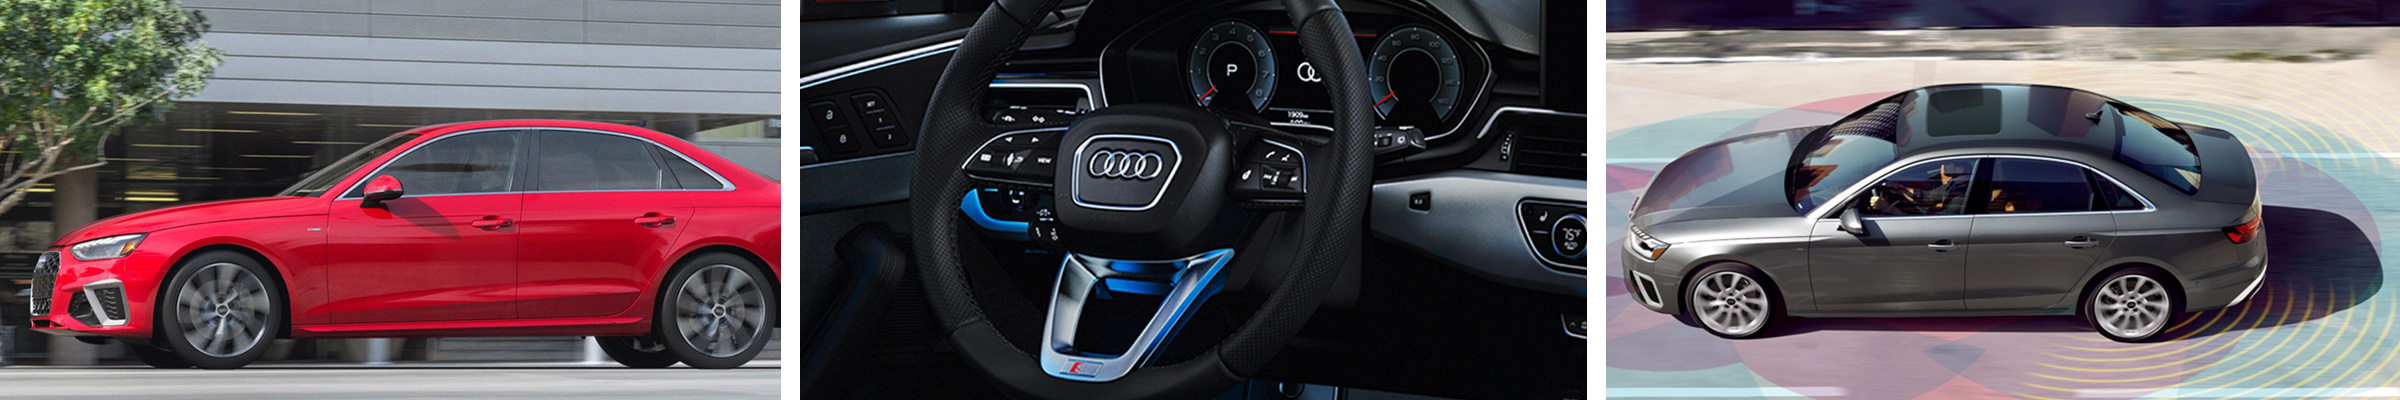 2022 Audi A4